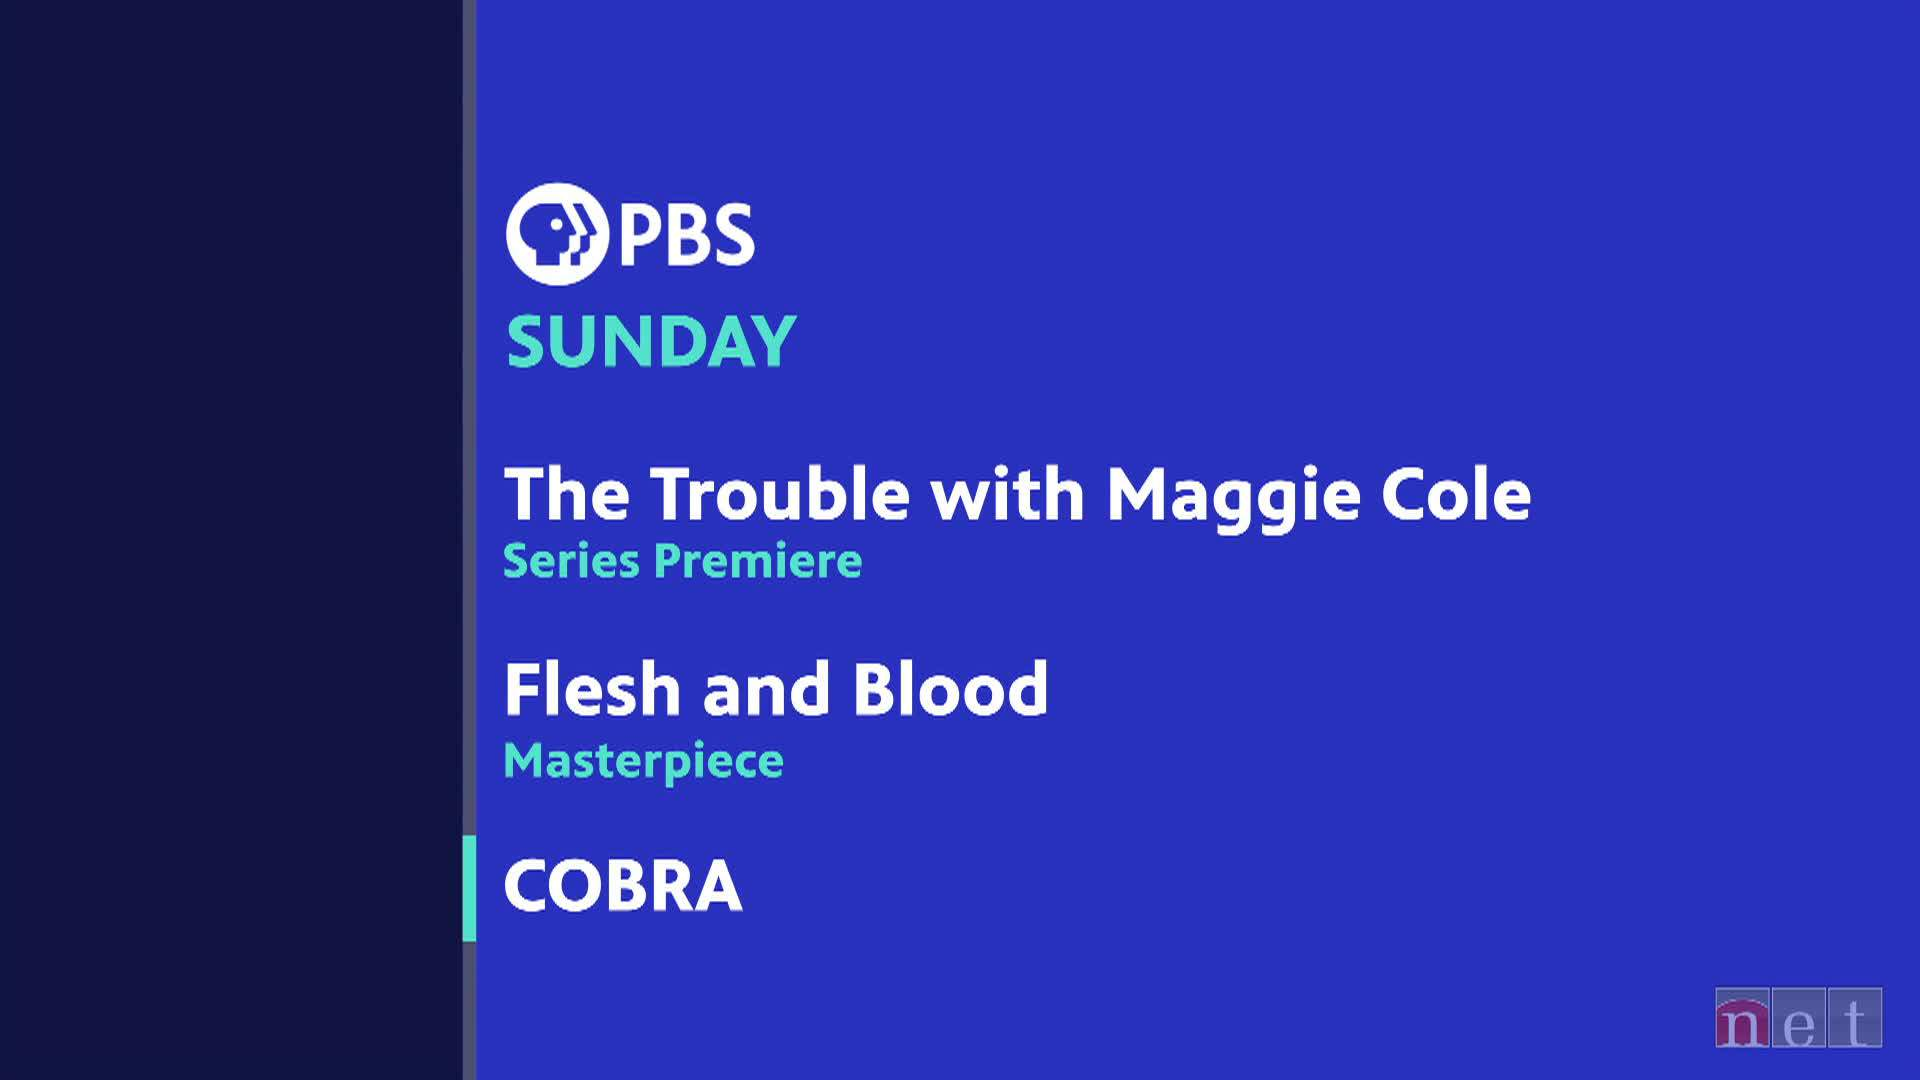 PBS Sunday Lineup Fall 2020 Oct 18